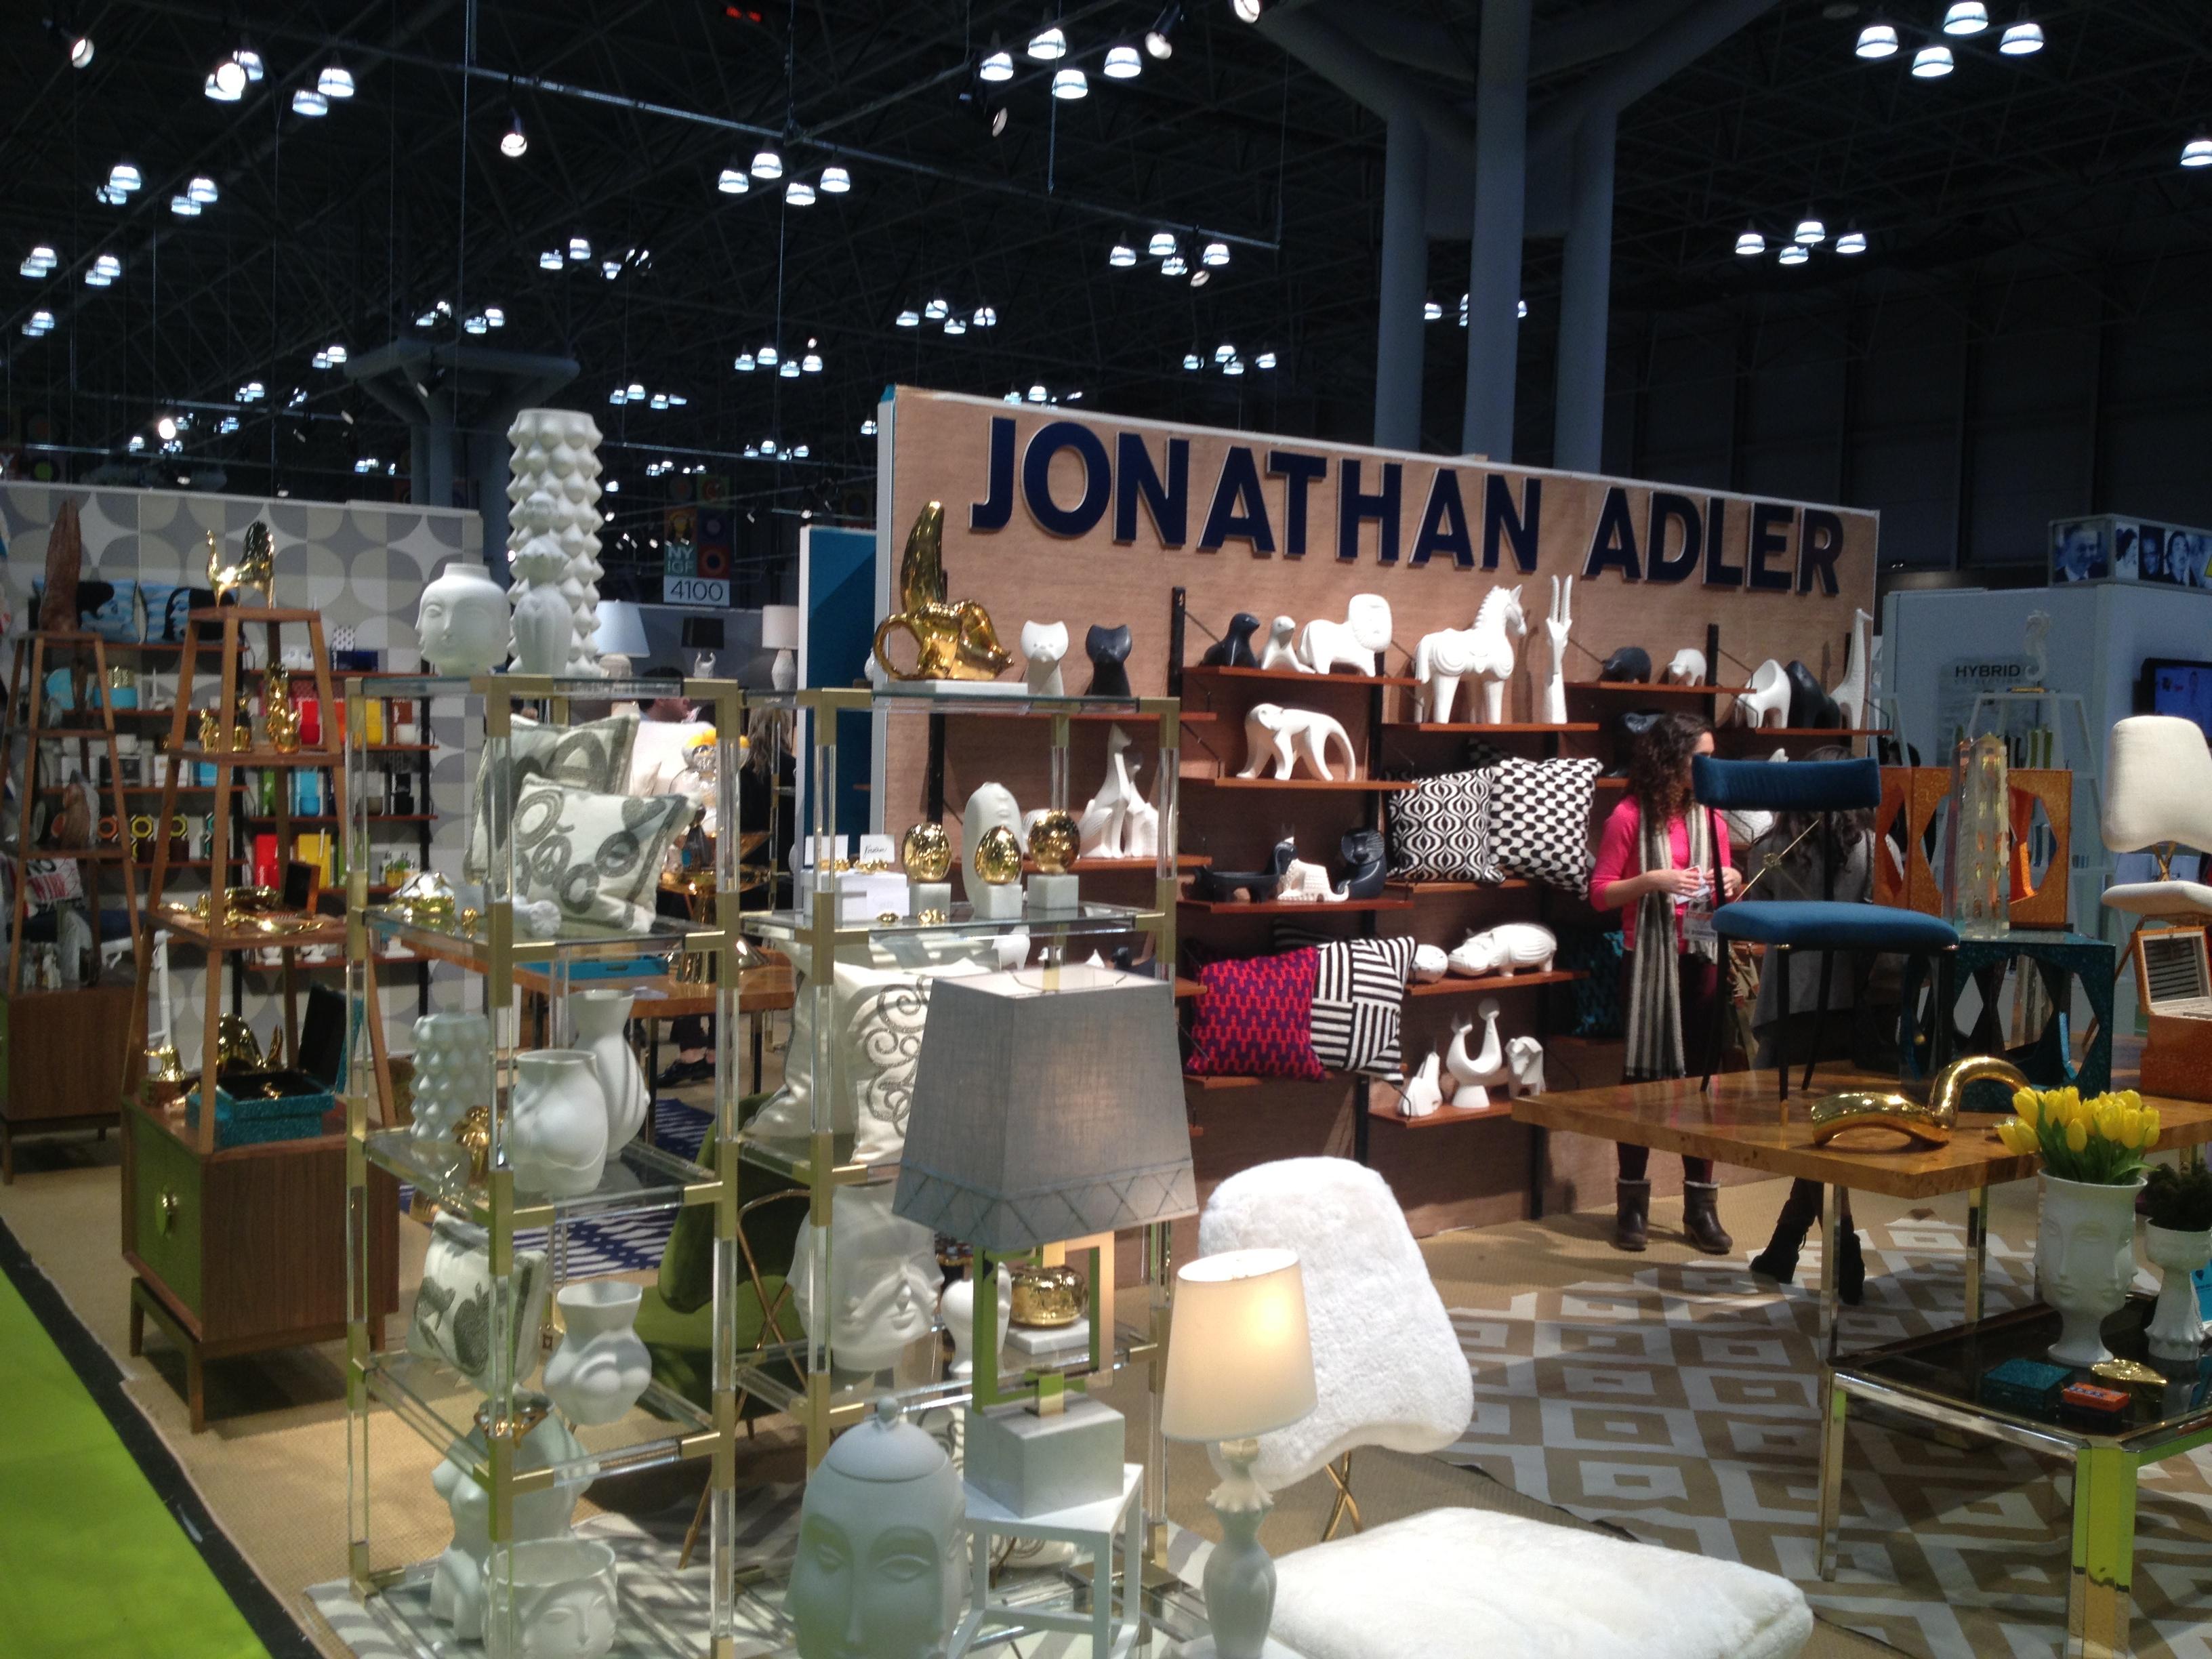 New york international gift fair melissa wehrman for New york international gift fair